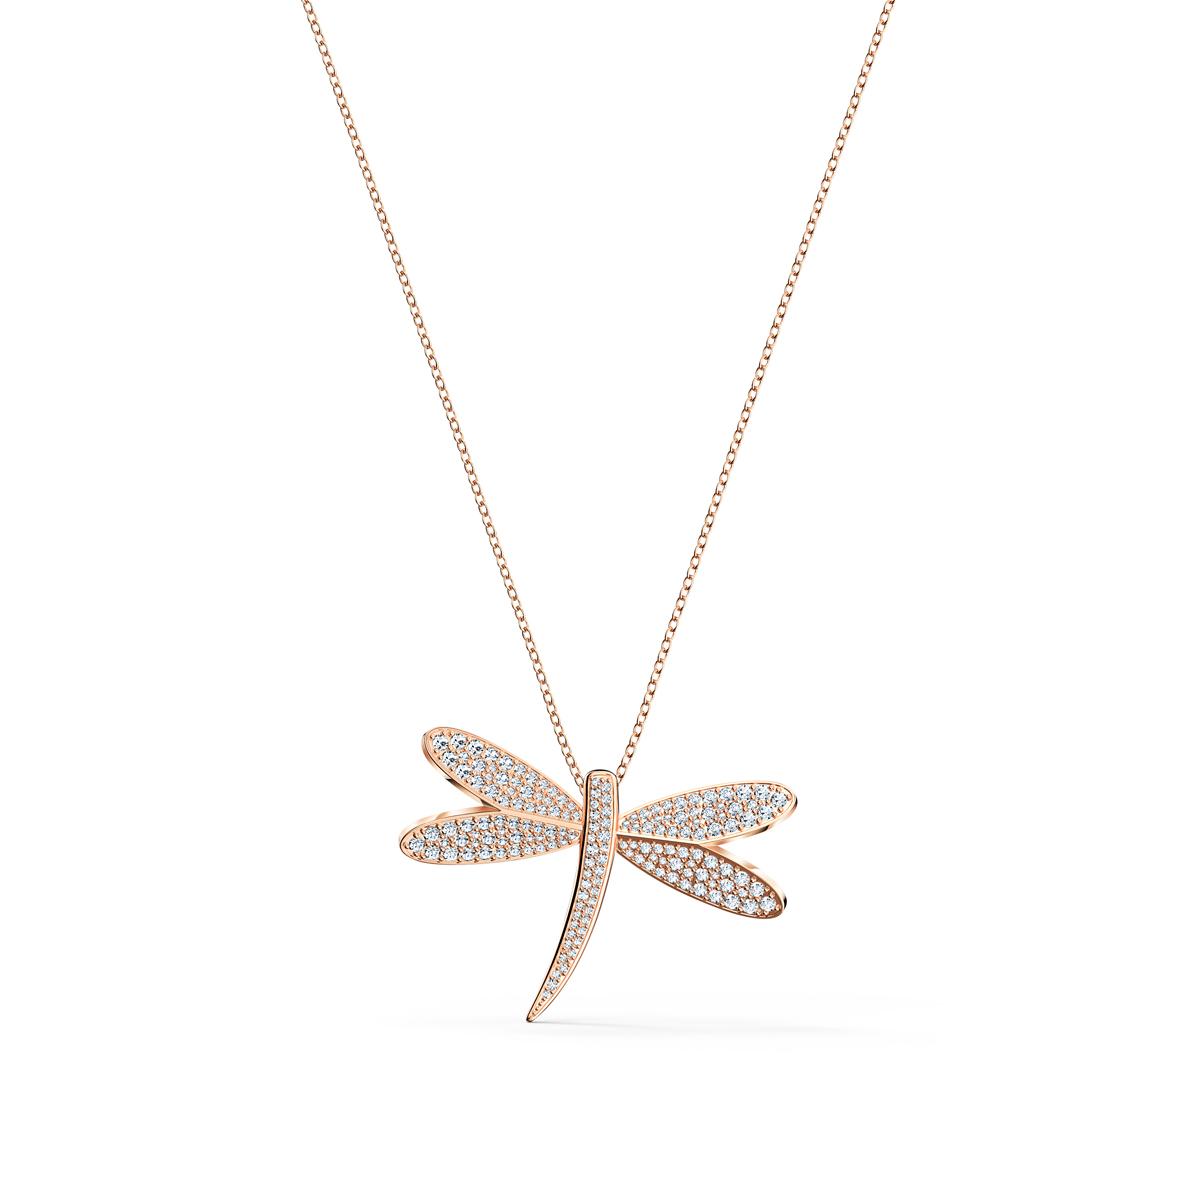 Swarovski Necklace Eternal Flower Necklace Long Light Multi Rose Gold